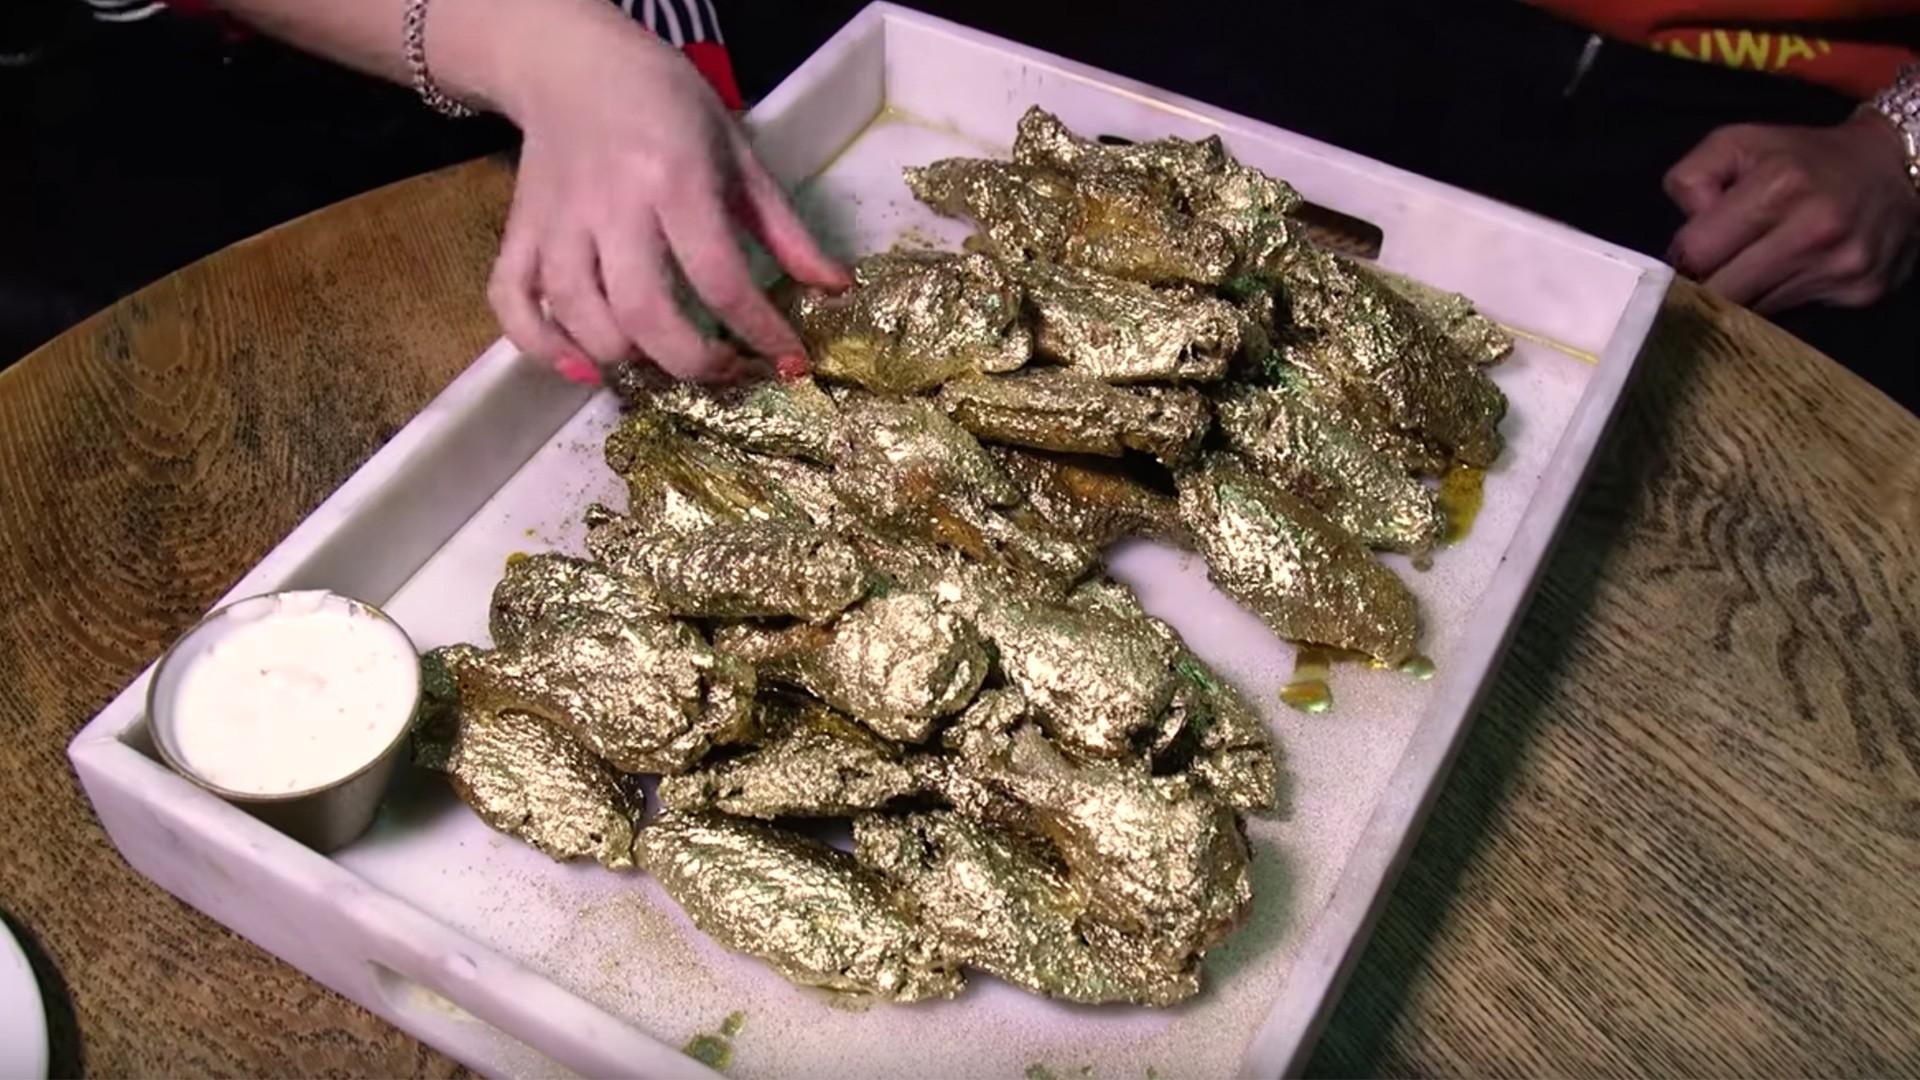 Jonathan Cheban S 24 Karat Gold Chicken Wings Are Way Too